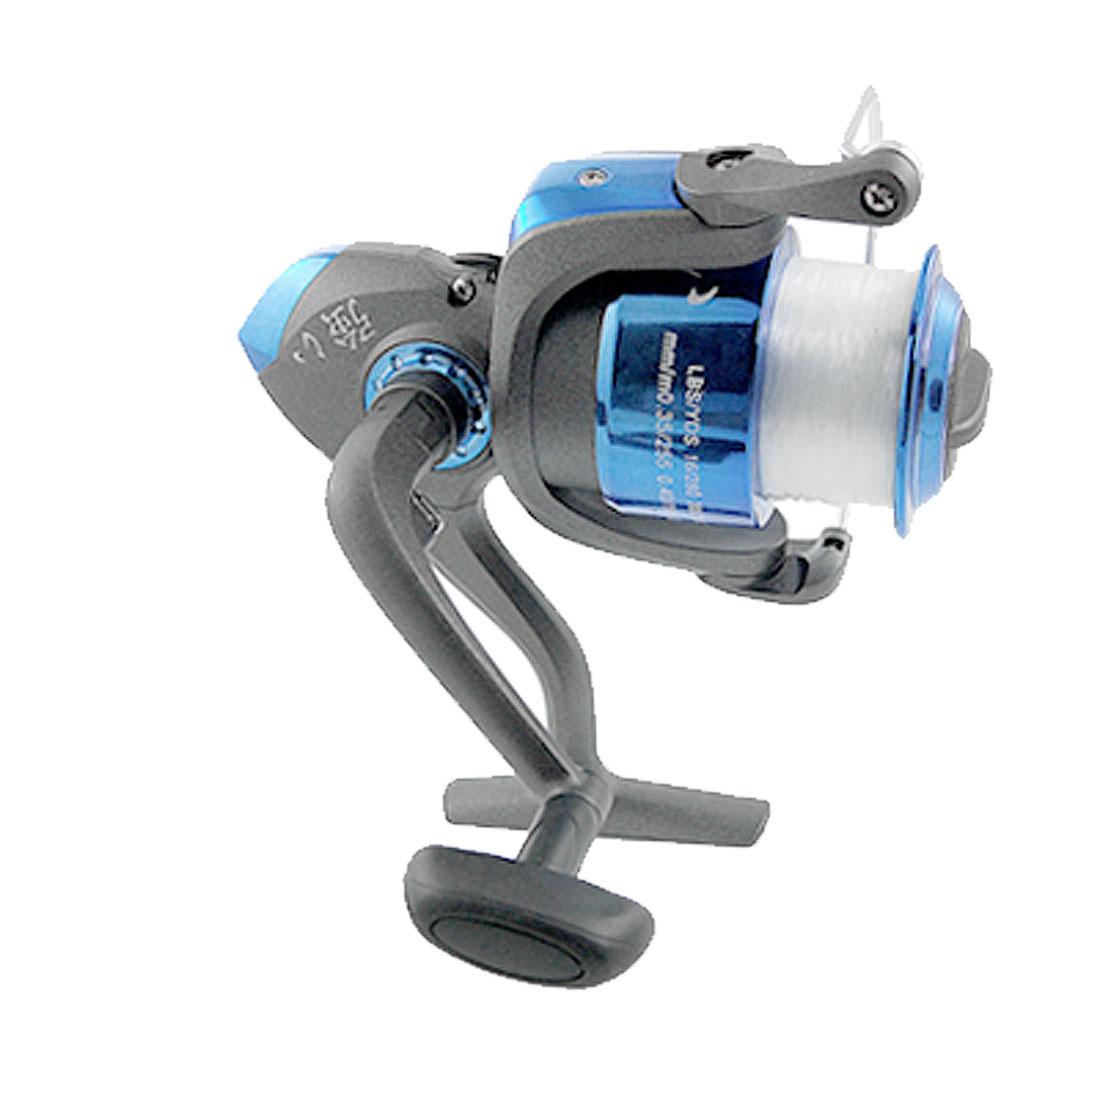 Fishing Plastic Metal 4.7:1 Gear Ratio 3 BB Spinning Reel Roller